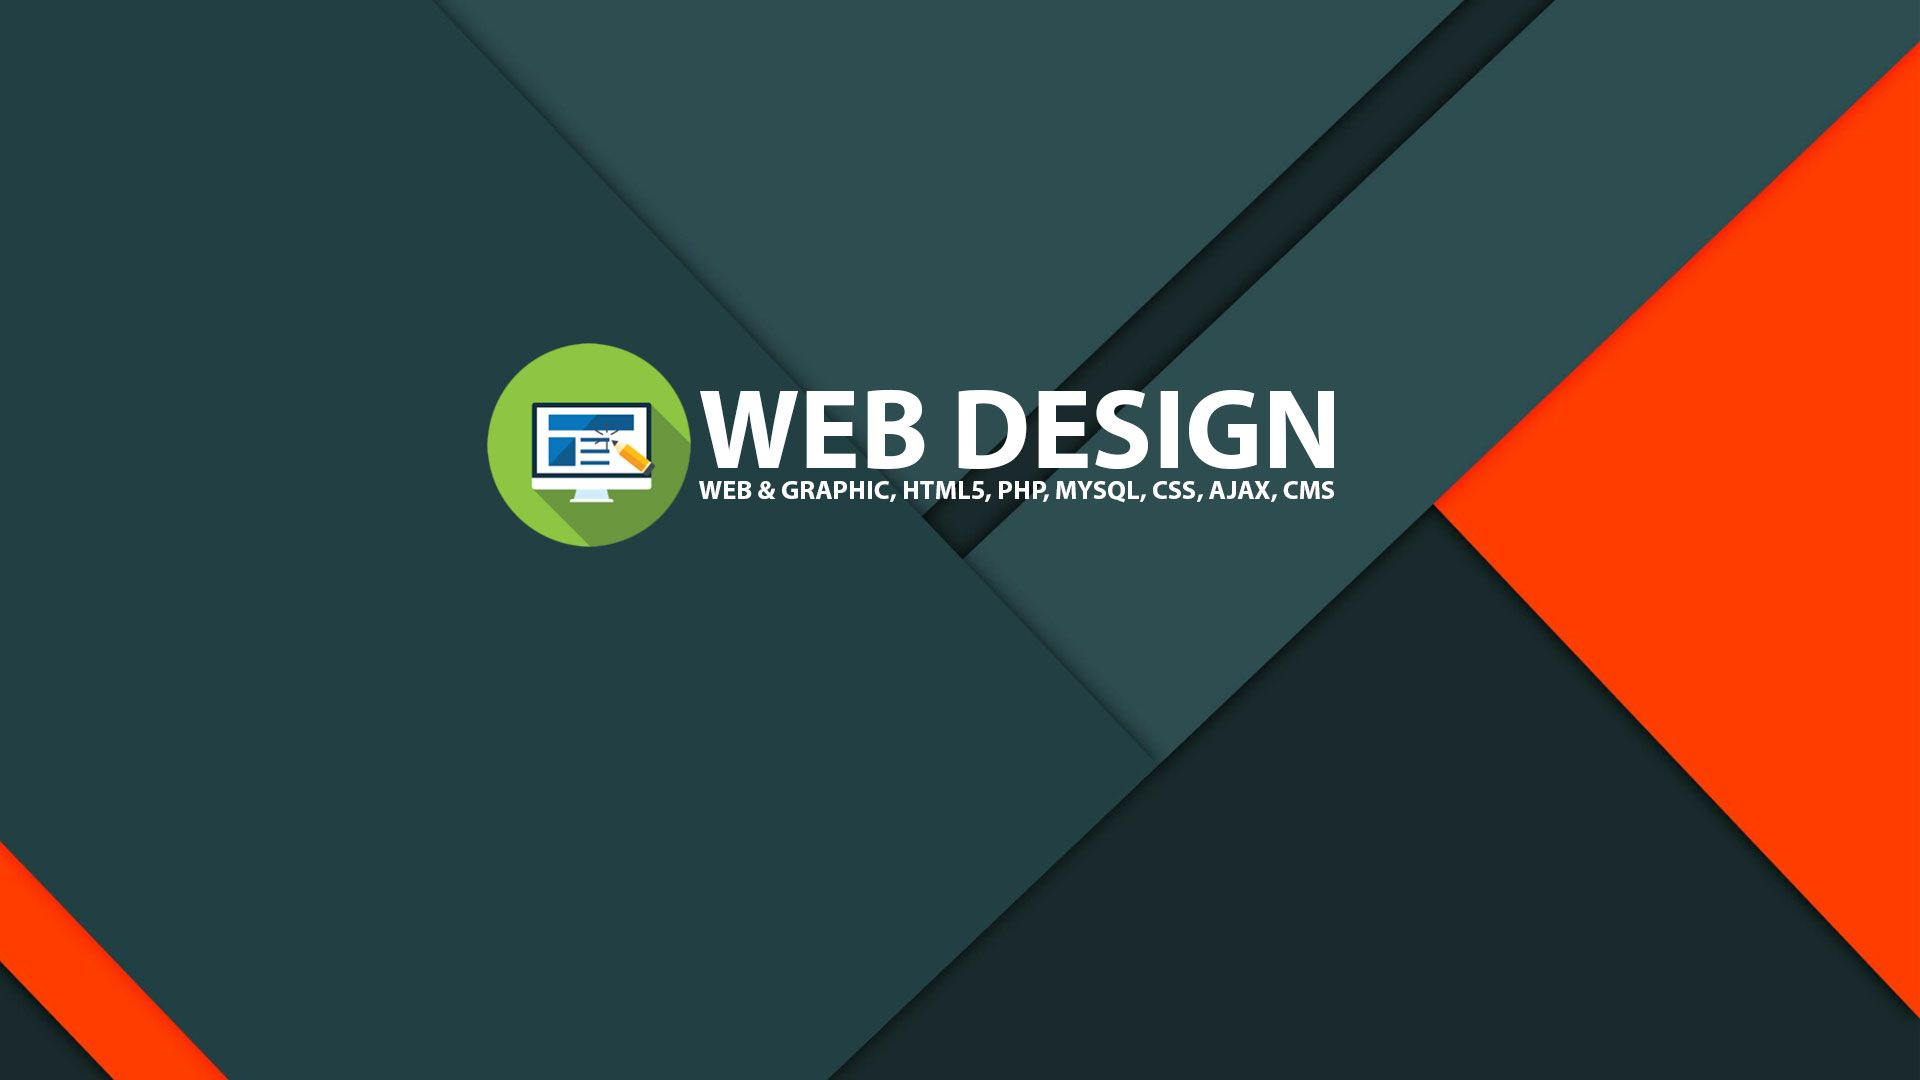 Affidate il vostro business ad esperti del settore. http://www.squaremediaagency.it/web-marketing (web marketing) #webdesign #website #graphicdesign